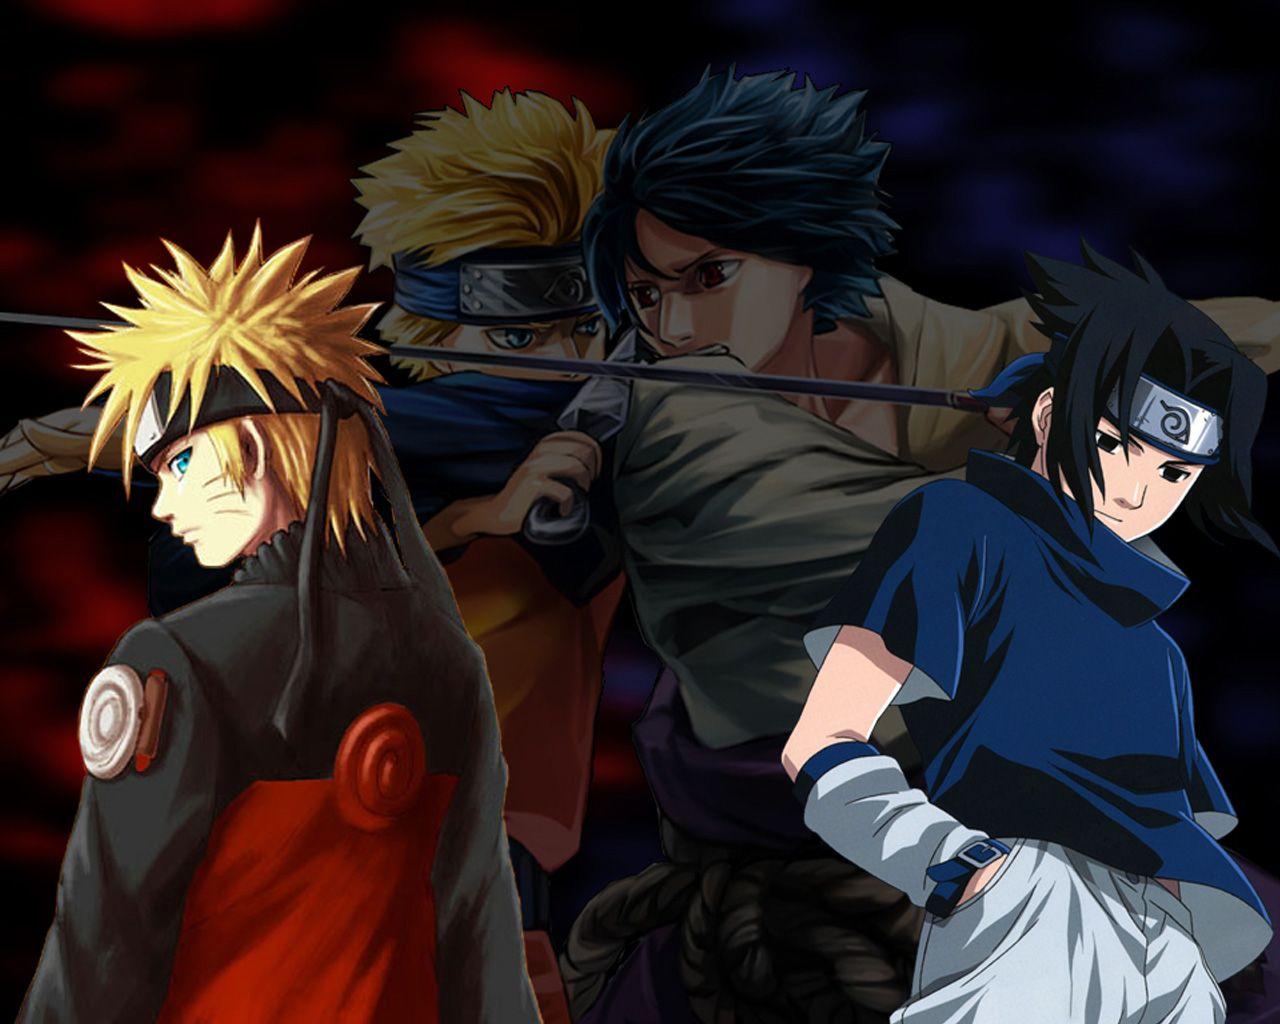 Naruto Vs Sasuke Wallpapers Images Sdeerwallpaper Imagenes De Y